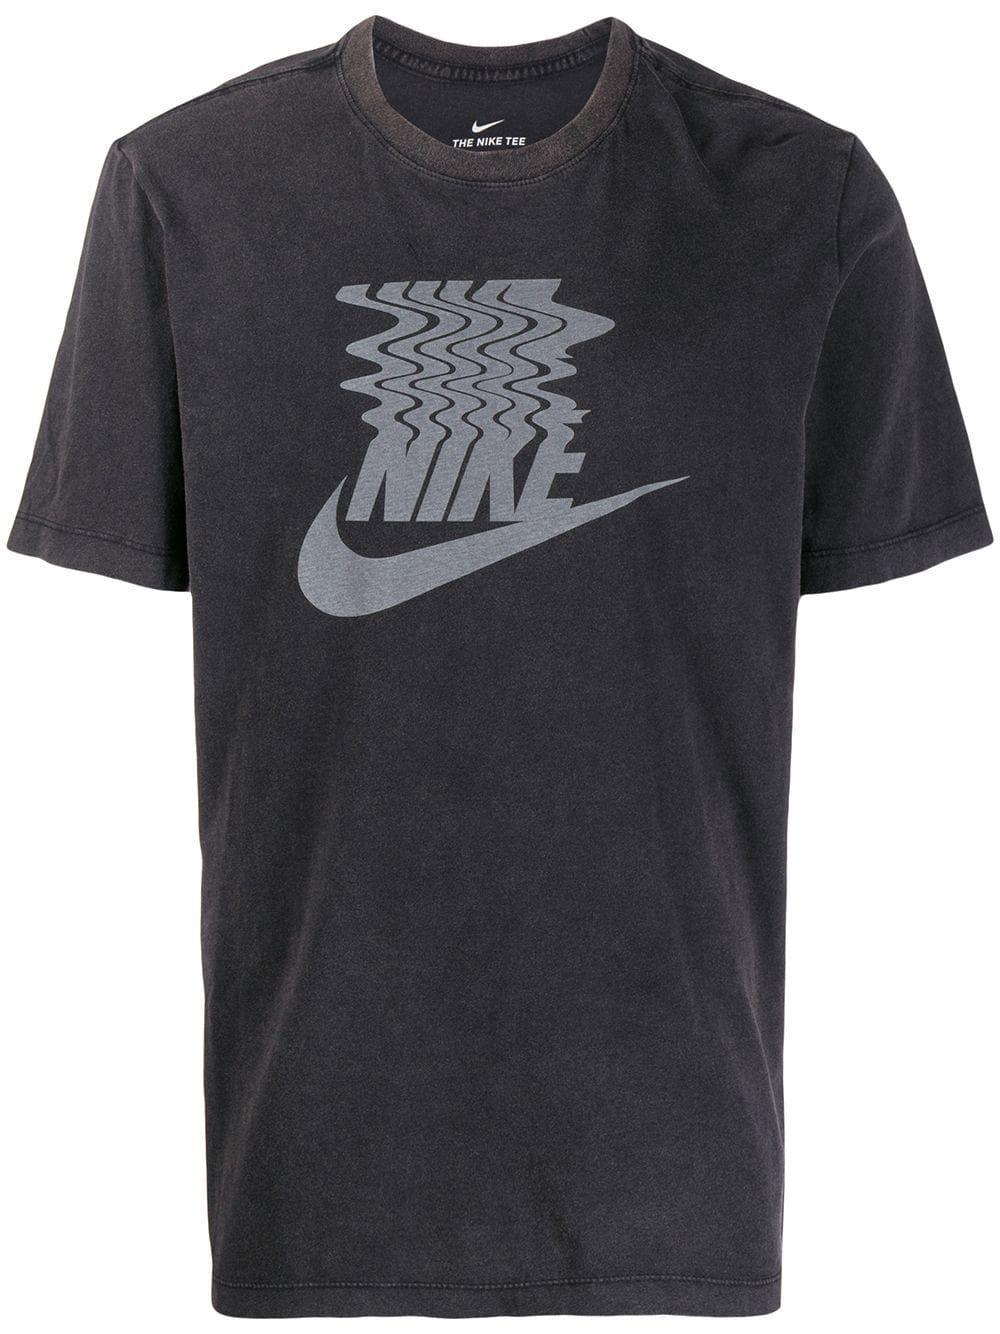 Nike Tshirt Mit Logoprint Schwarz In Black (With